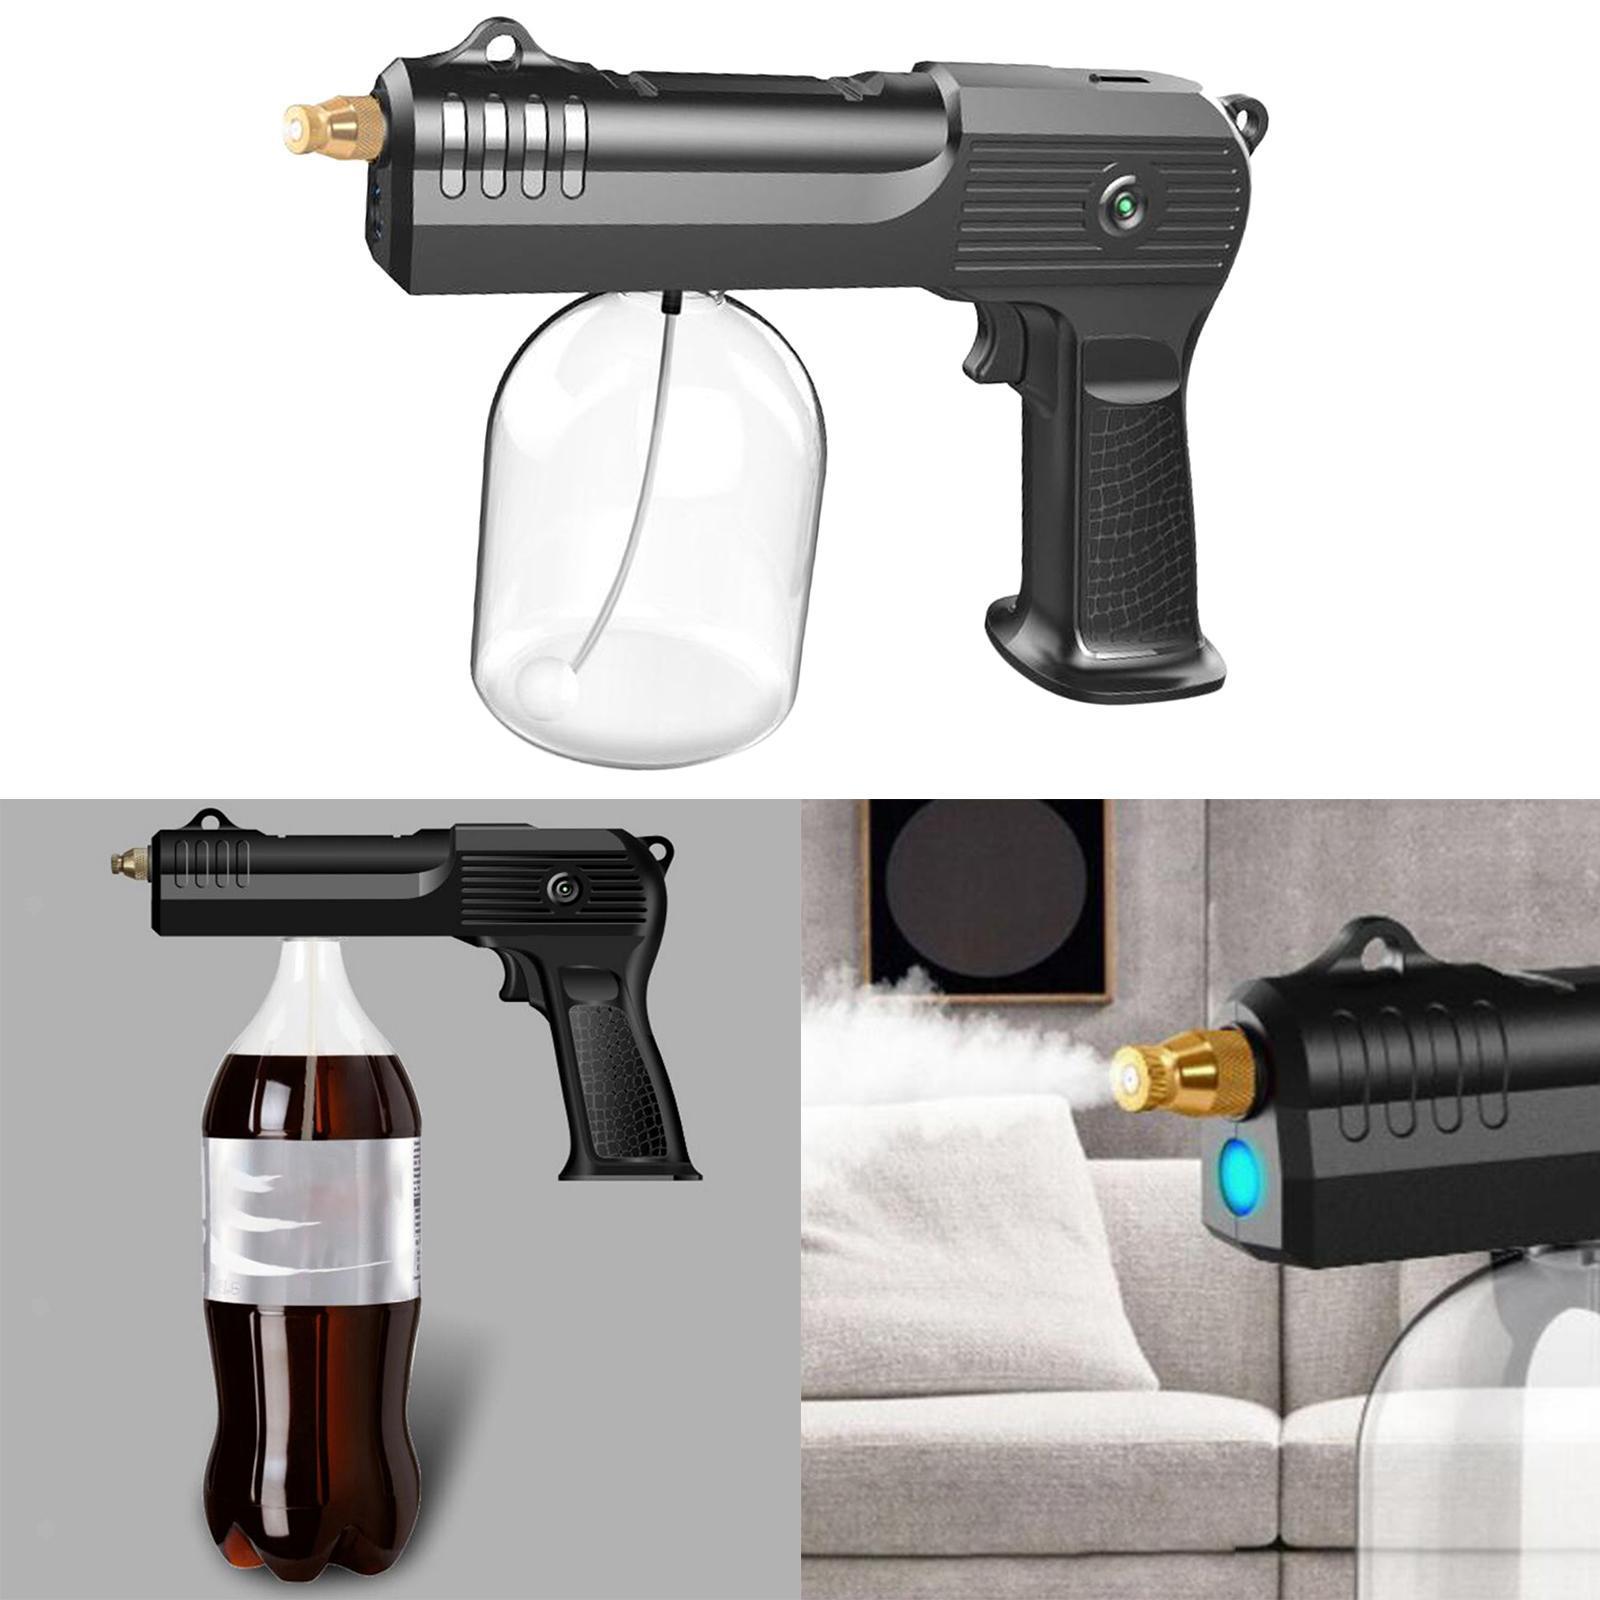 miniature 4 - USB Sanitizer Sprayer 500ml Disinfectant Fogger Mister Spray Gun Portable